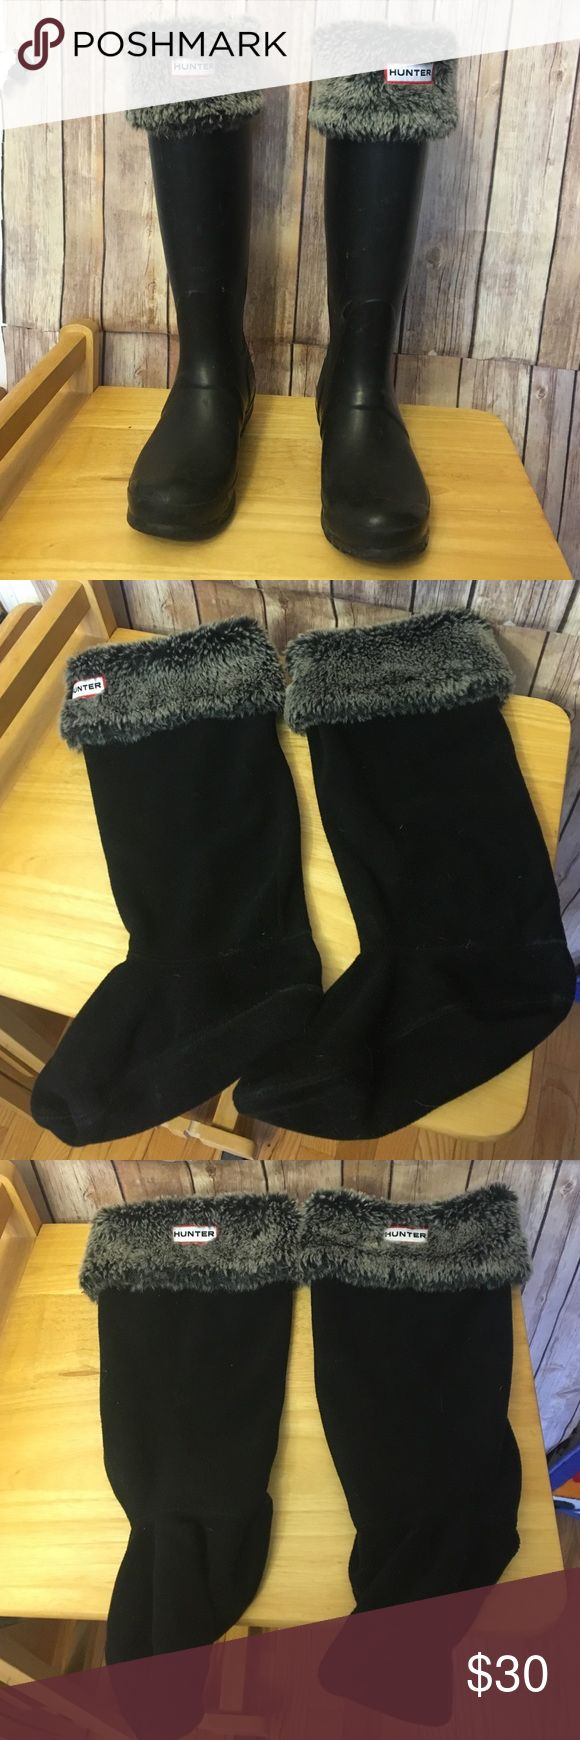 Hunter fleece wellie socks Fold over hunter fleece wellie liners. Comfortable and warm. EUC. Size small/medium. Hunter Shoes Winter & Rain Boots